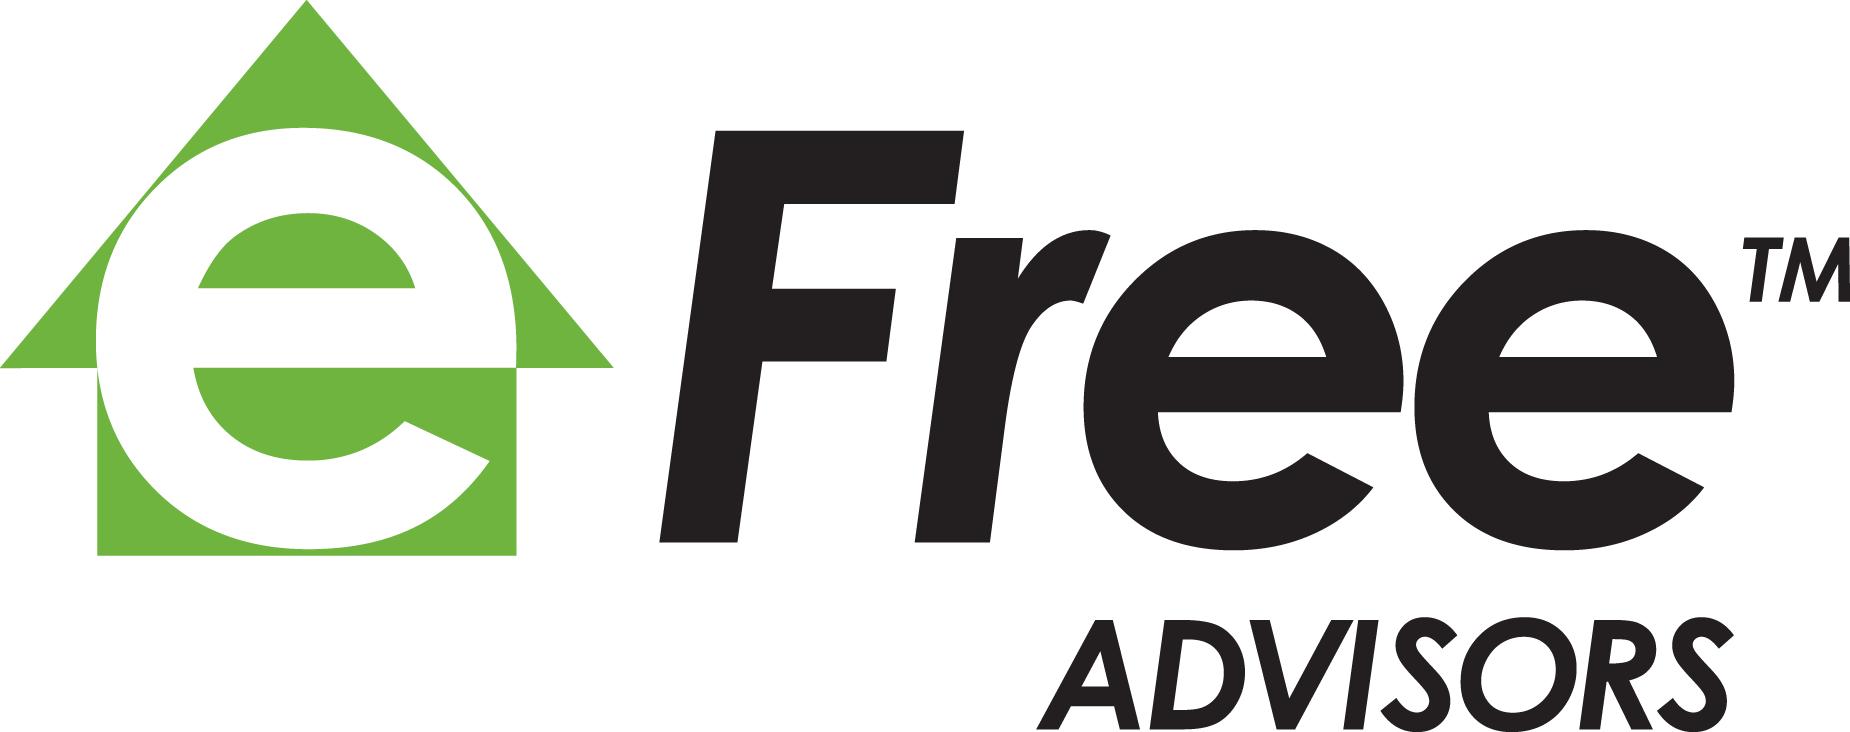 eFree Advisors Logo